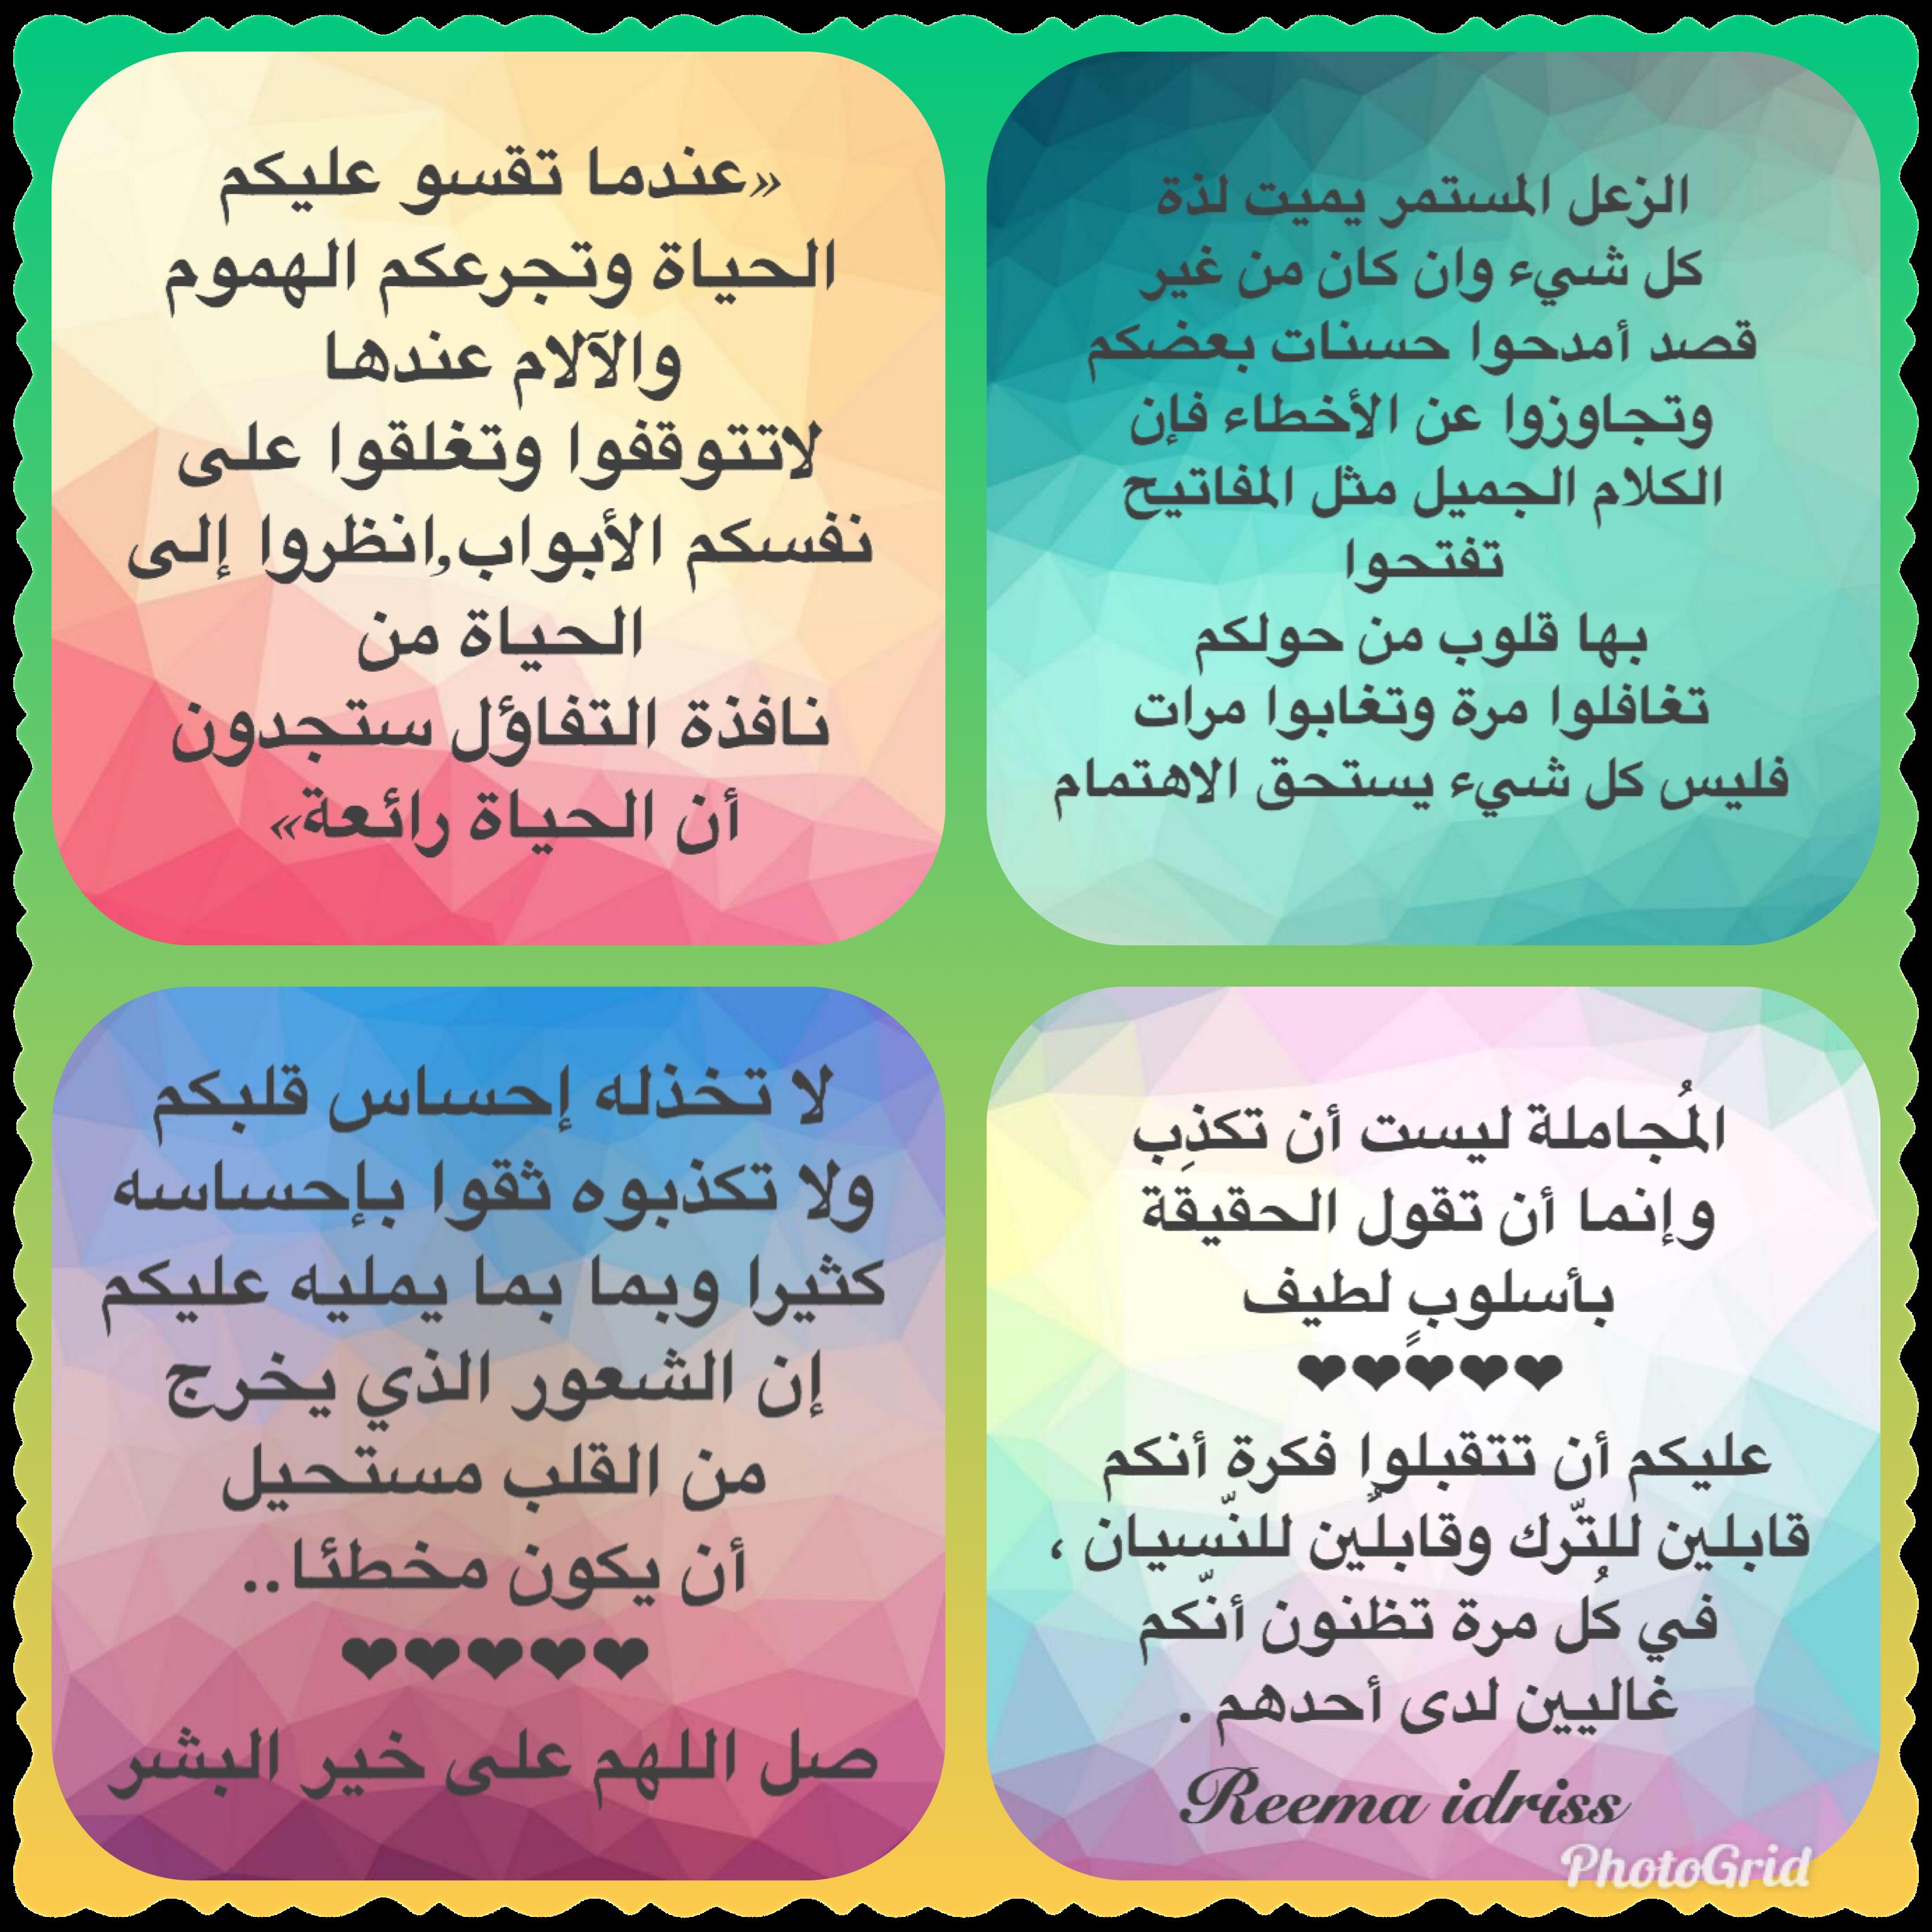 Pin By Reema Edriss On بطاقات الصباح Personalized Items Receipt Person